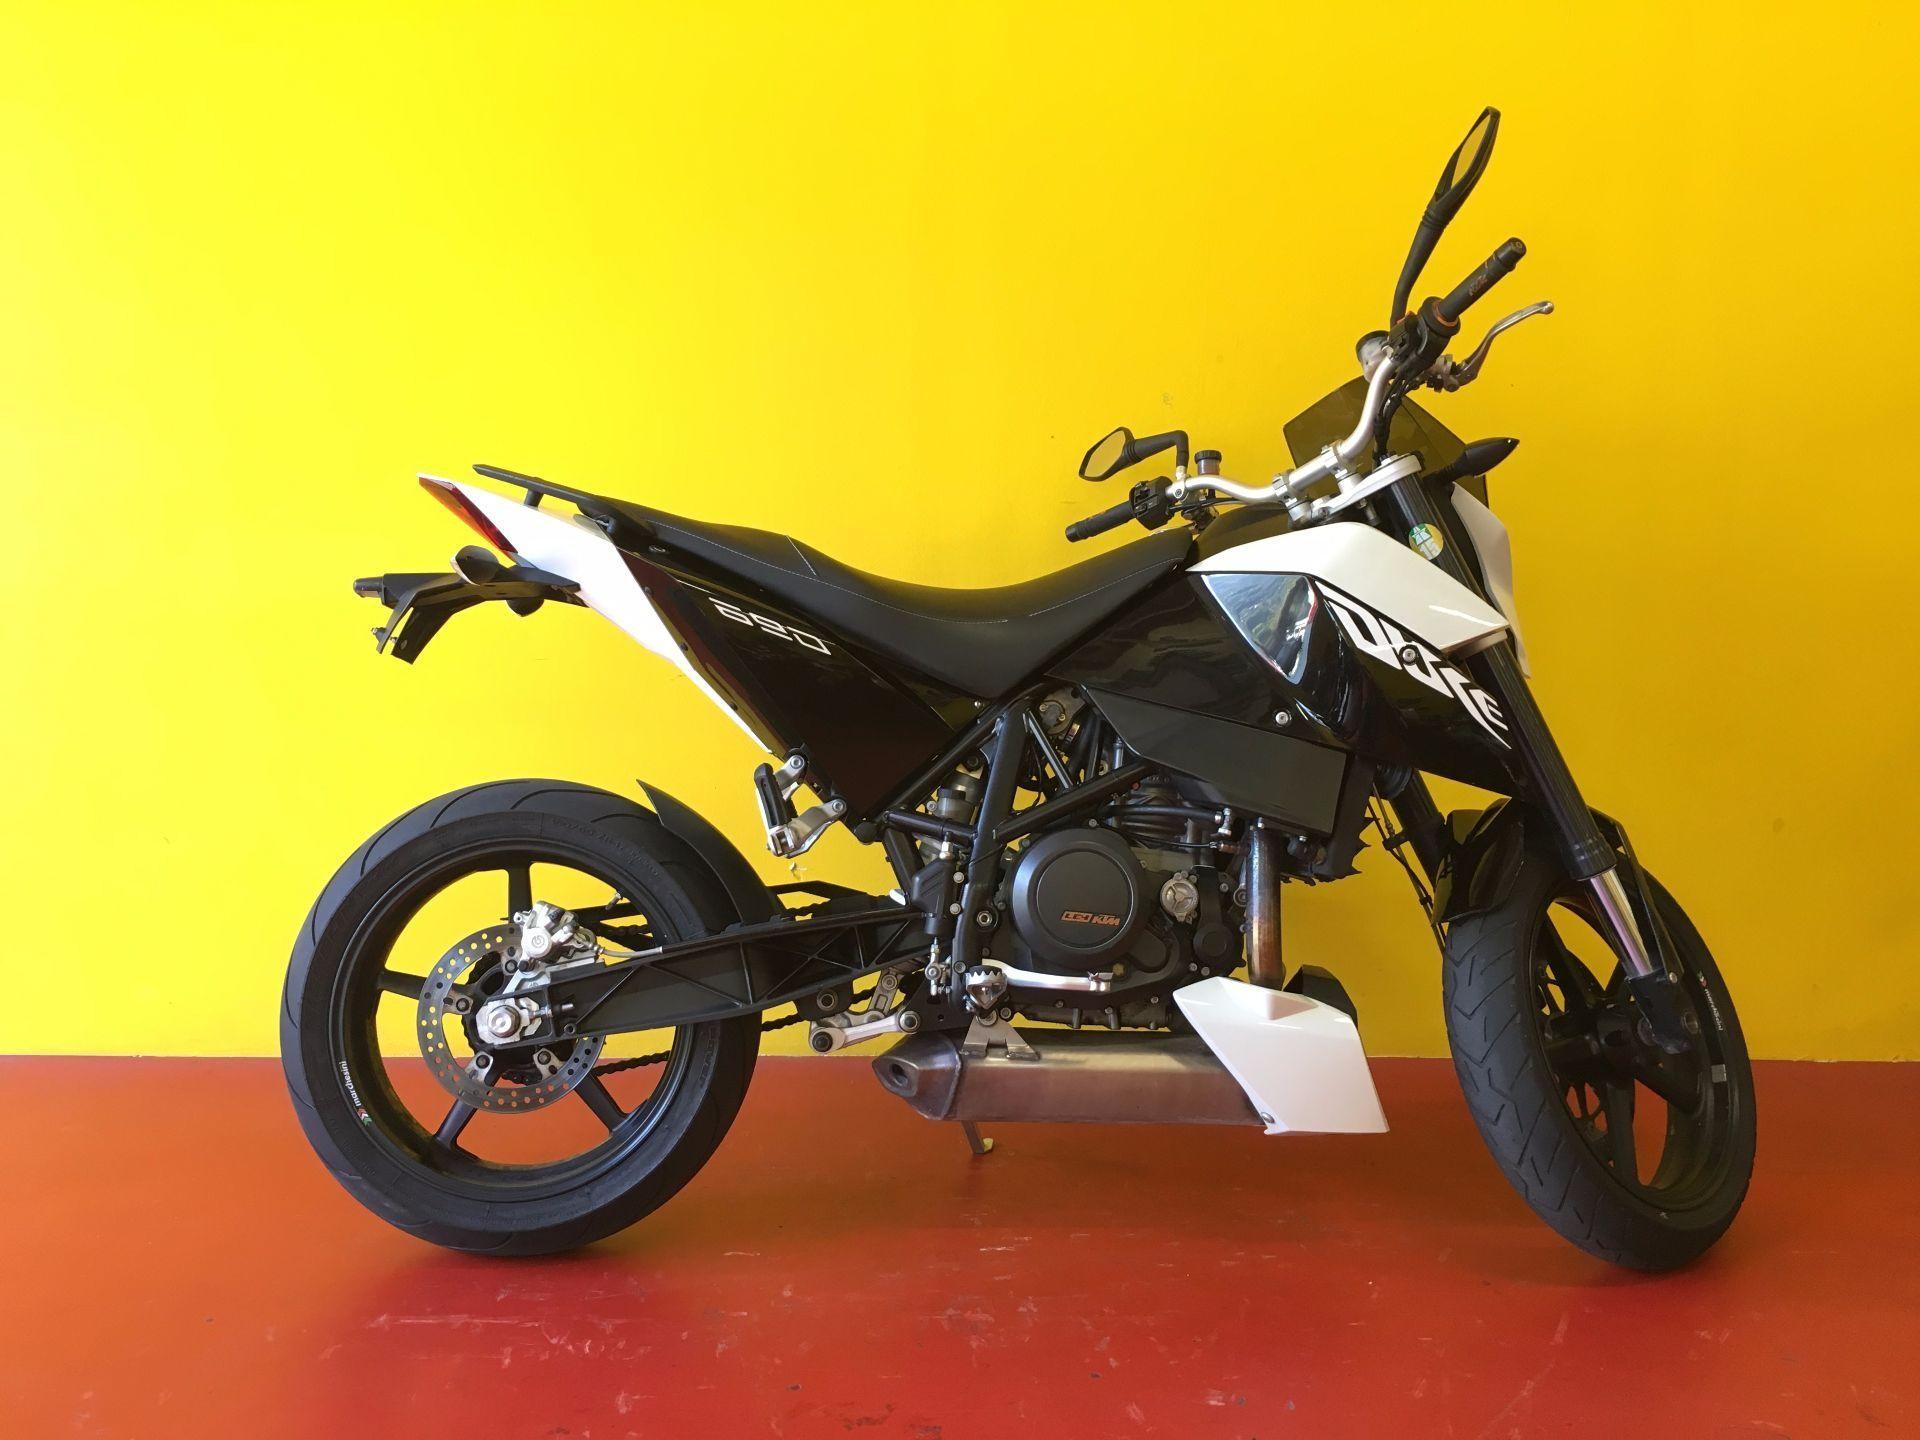 motorrad occasion kaufen ktm 690 duke iii centro moto ticino camorino camorino. Black Bedroom Furniture Sets. Home Design Ideas